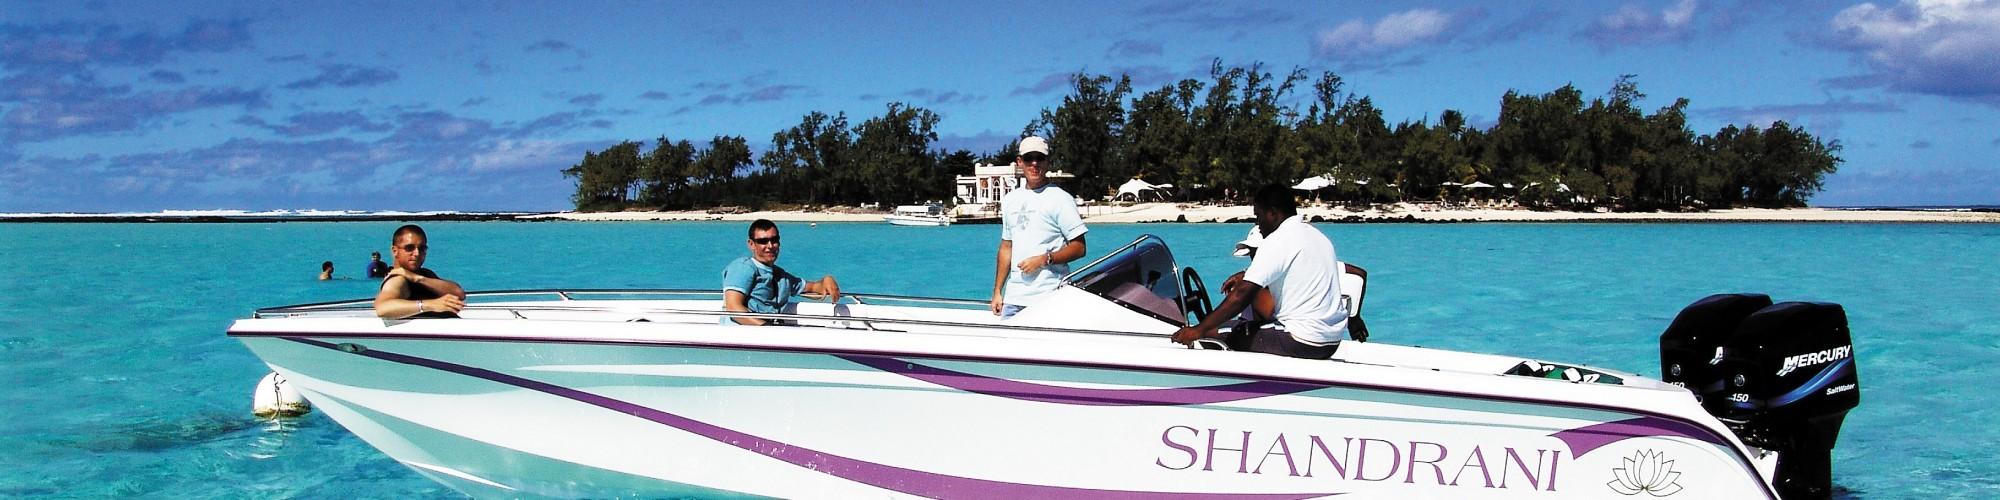 Shandrani, Mauritius